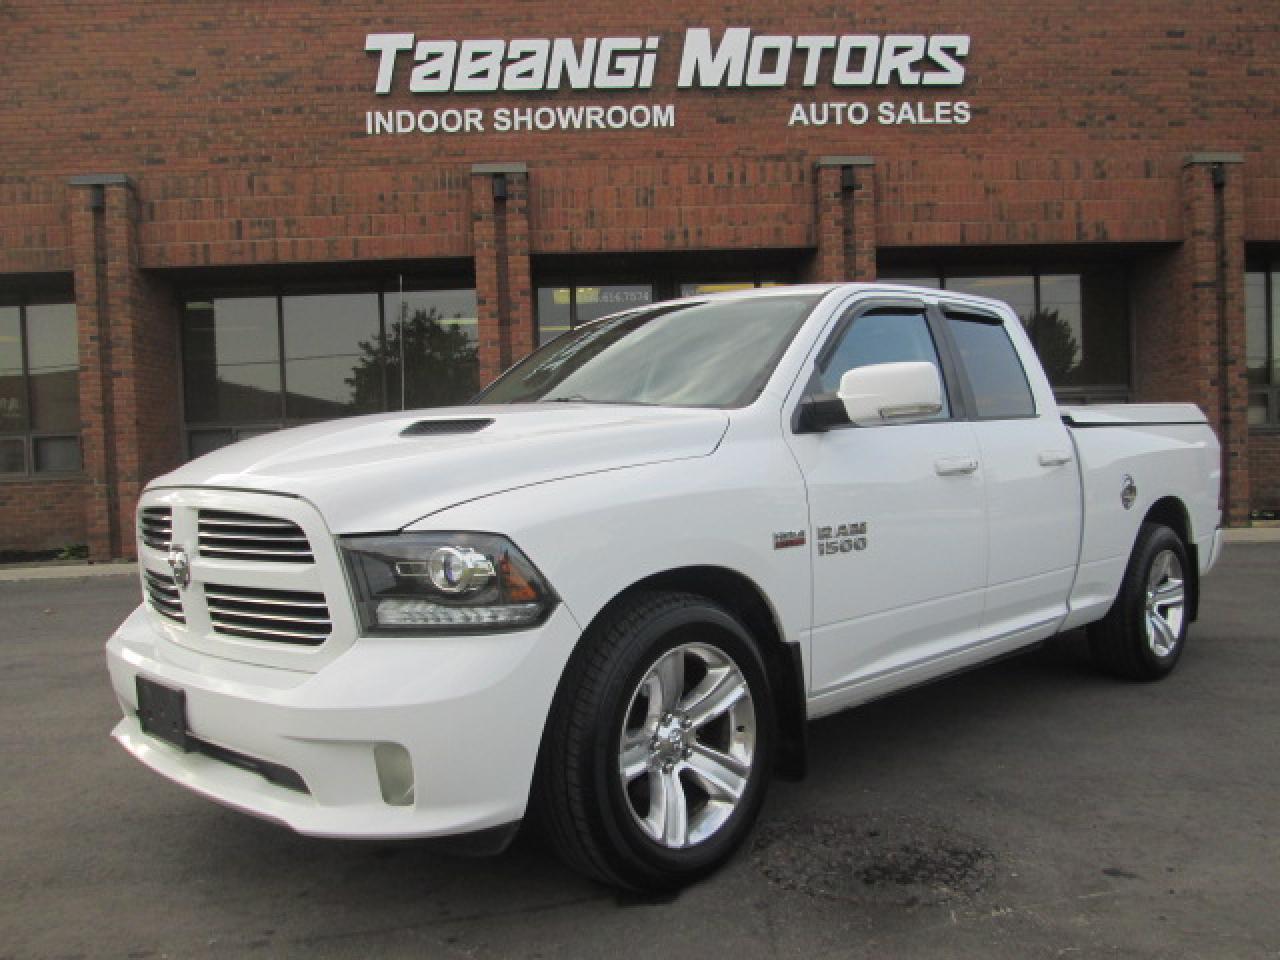 Photo of White 2014 Dodge Ram 1500